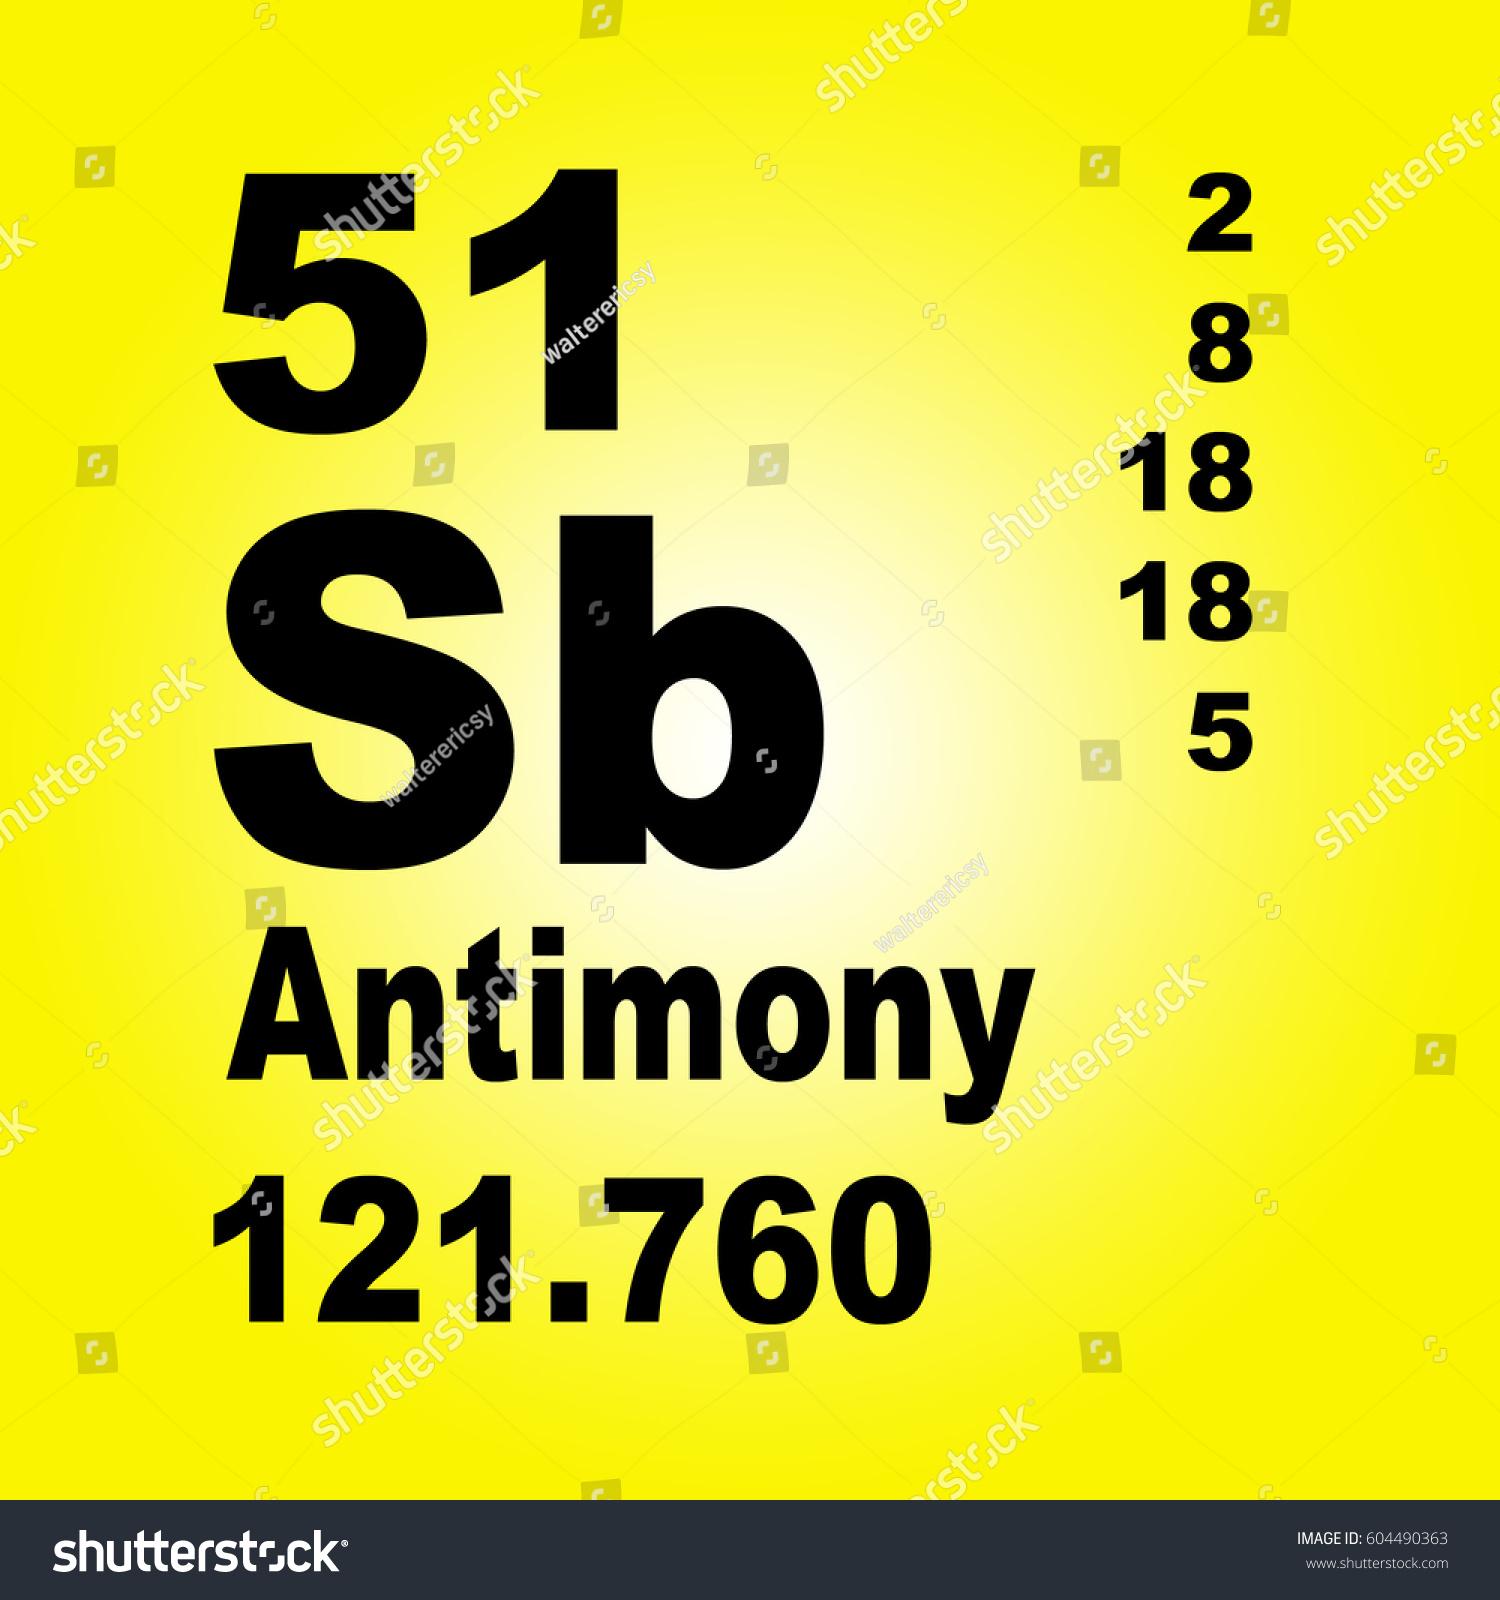 Antimony periodic table elements stock illustration 604490363 antimony periodic table of elements gamestrikefo Choice Image